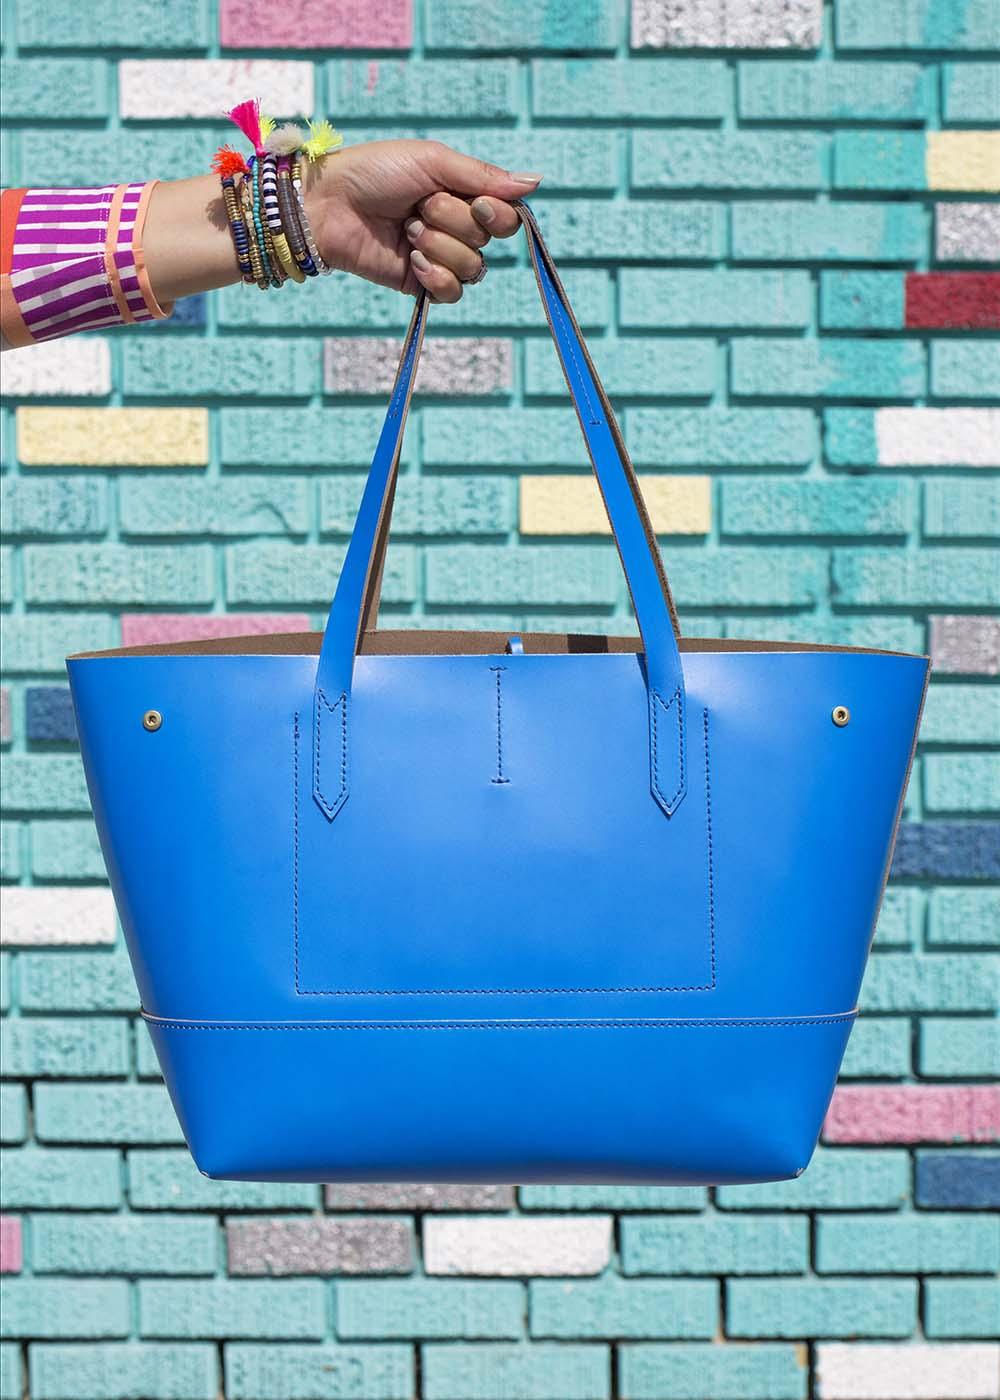 Bright Blue Leather Tote